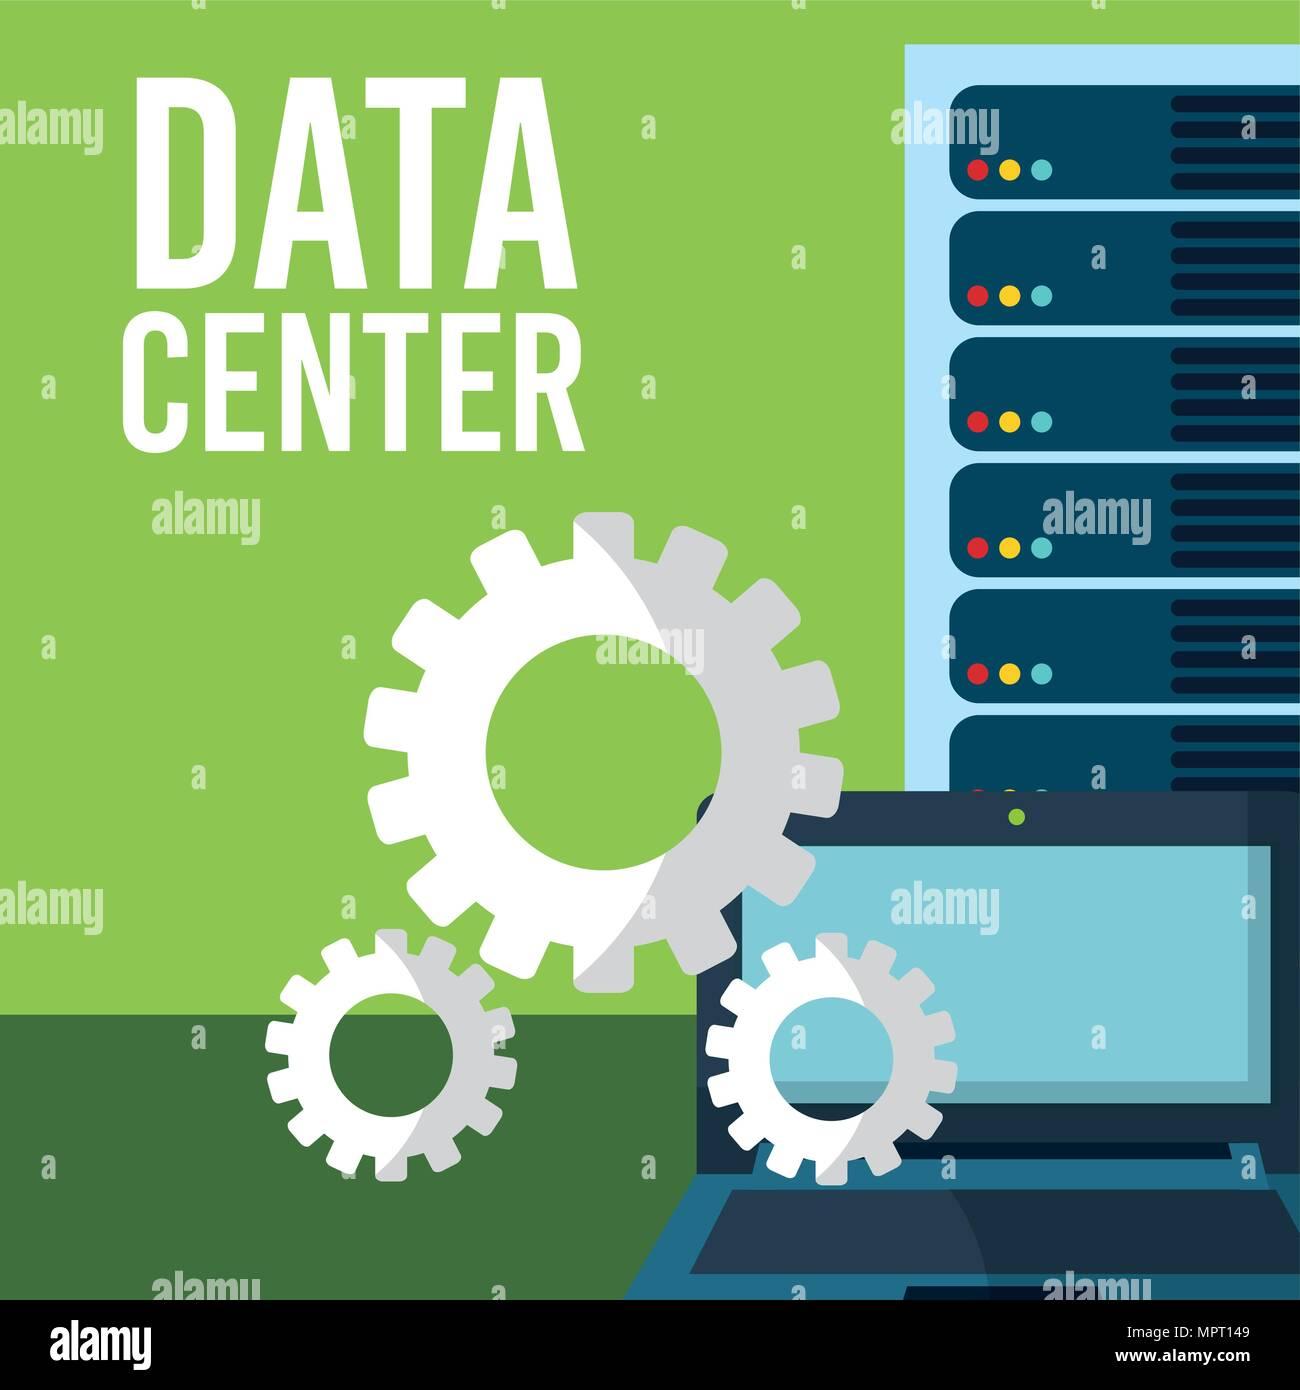 Database Communication Stock Photos Mpt 1000 Wiring Diagram Data Center Technology Image